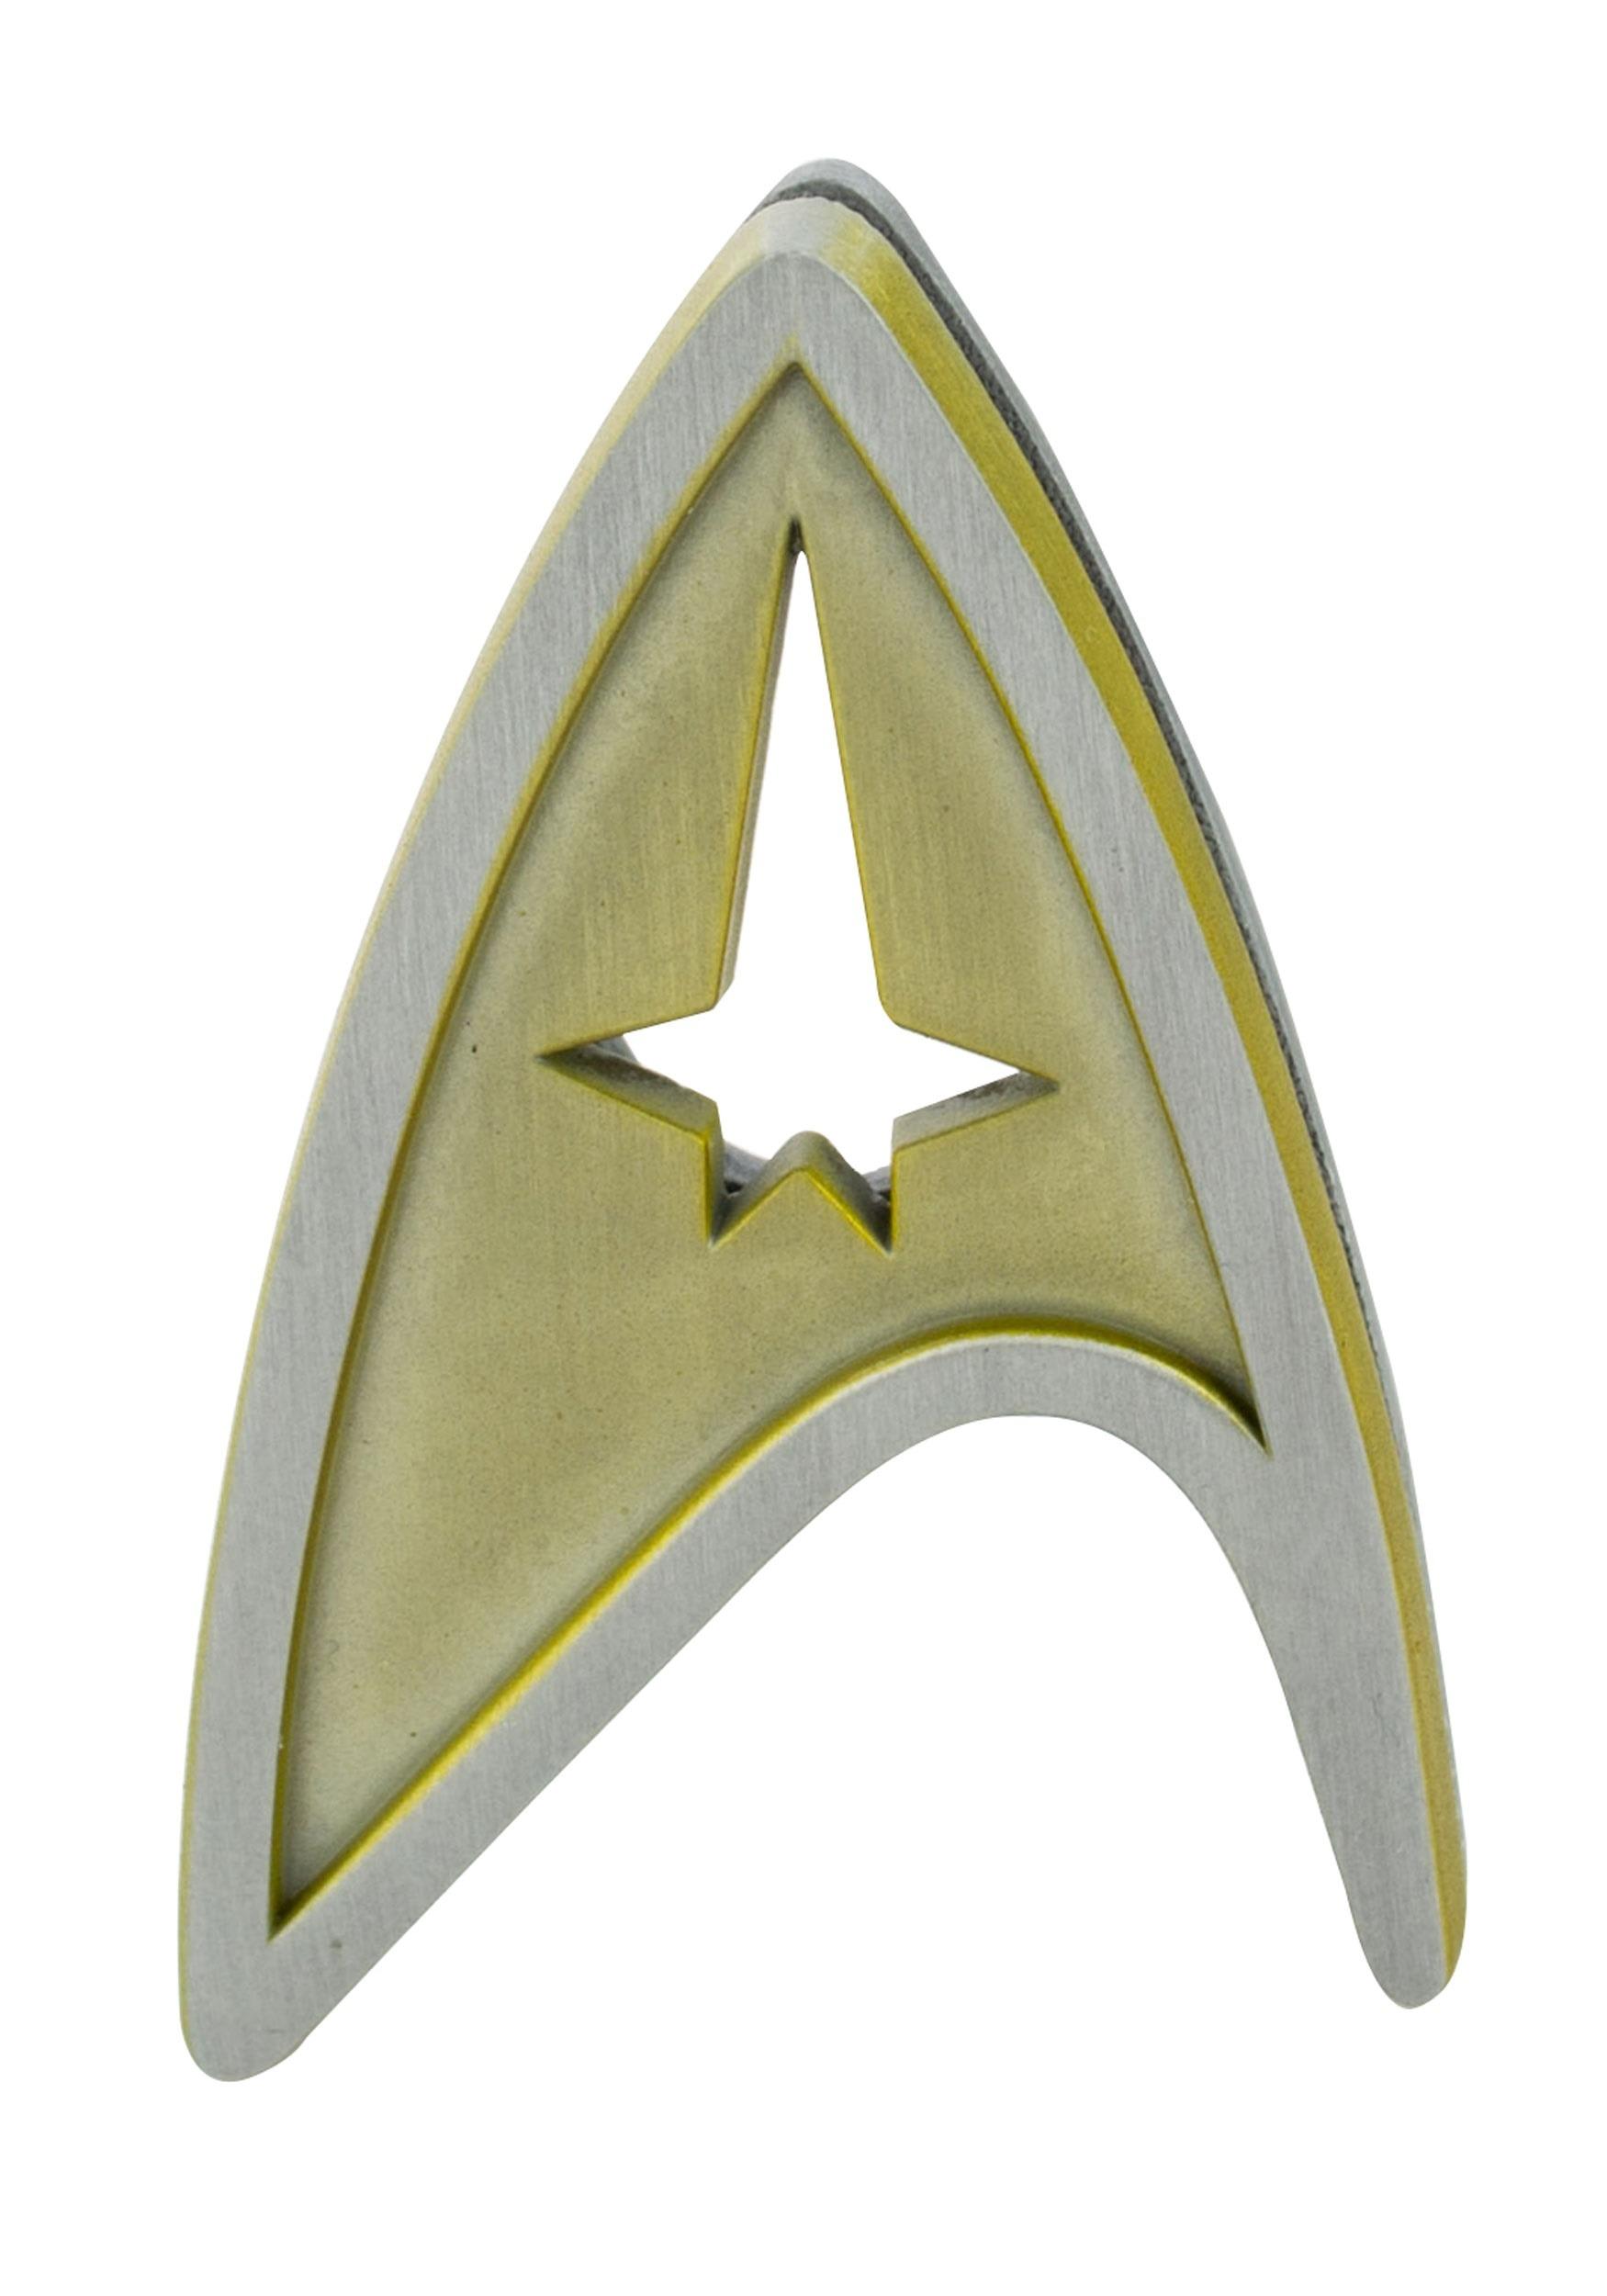 Star trek command insignia badge buycottarizona